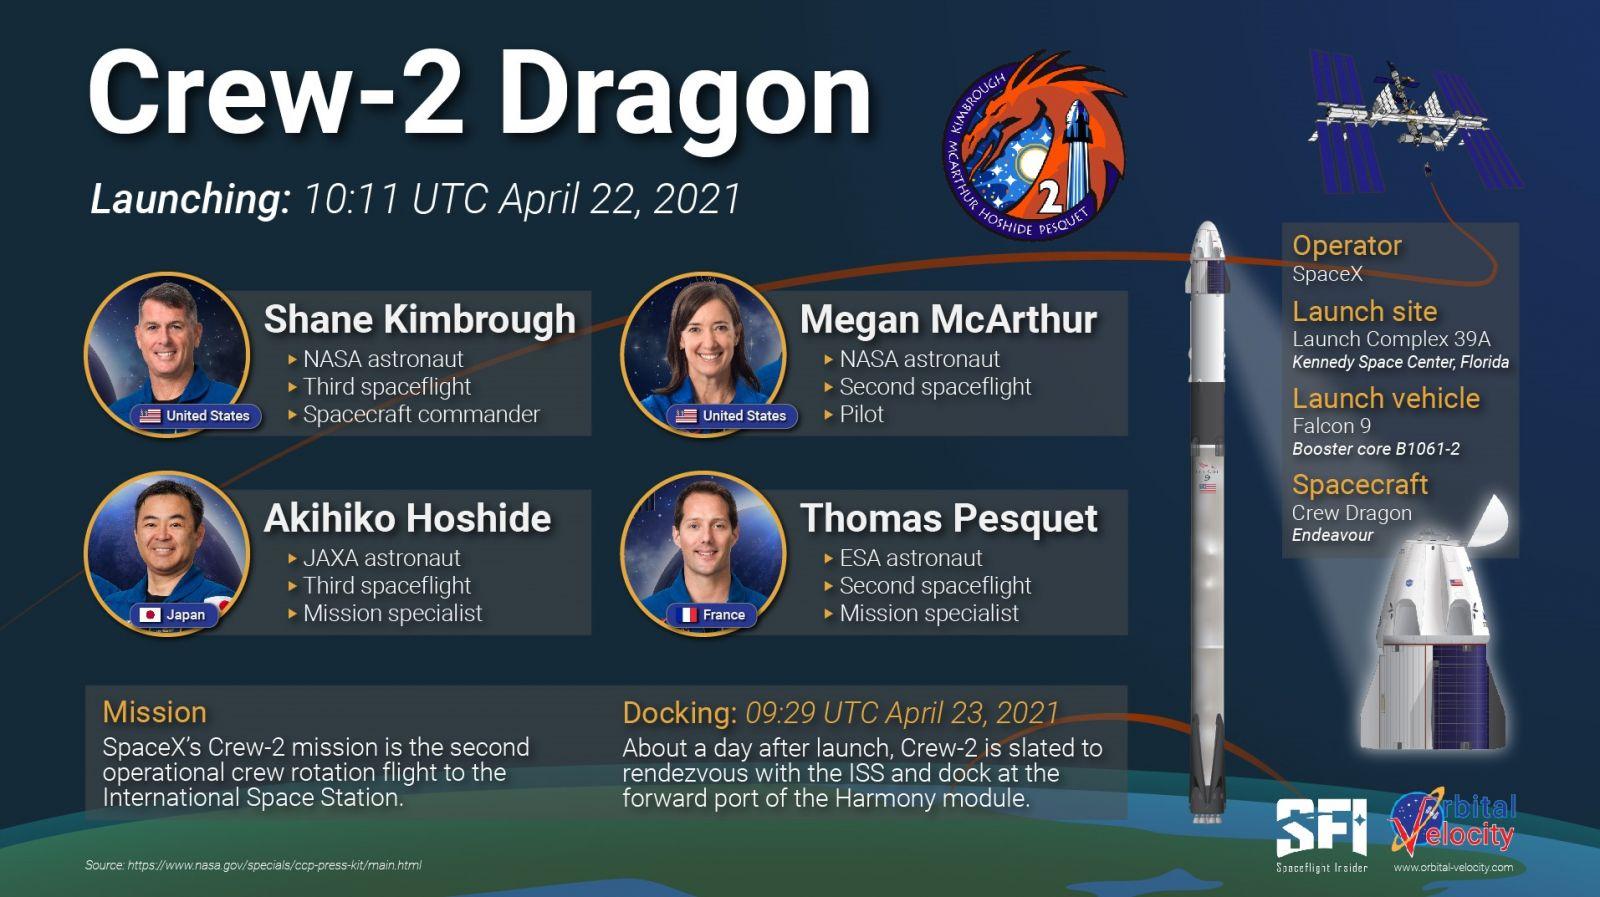 An infographic showing some of the basic Crew-2 details. Credit: Derek Richardson/Spaceflight Insider/Orbital Velocity